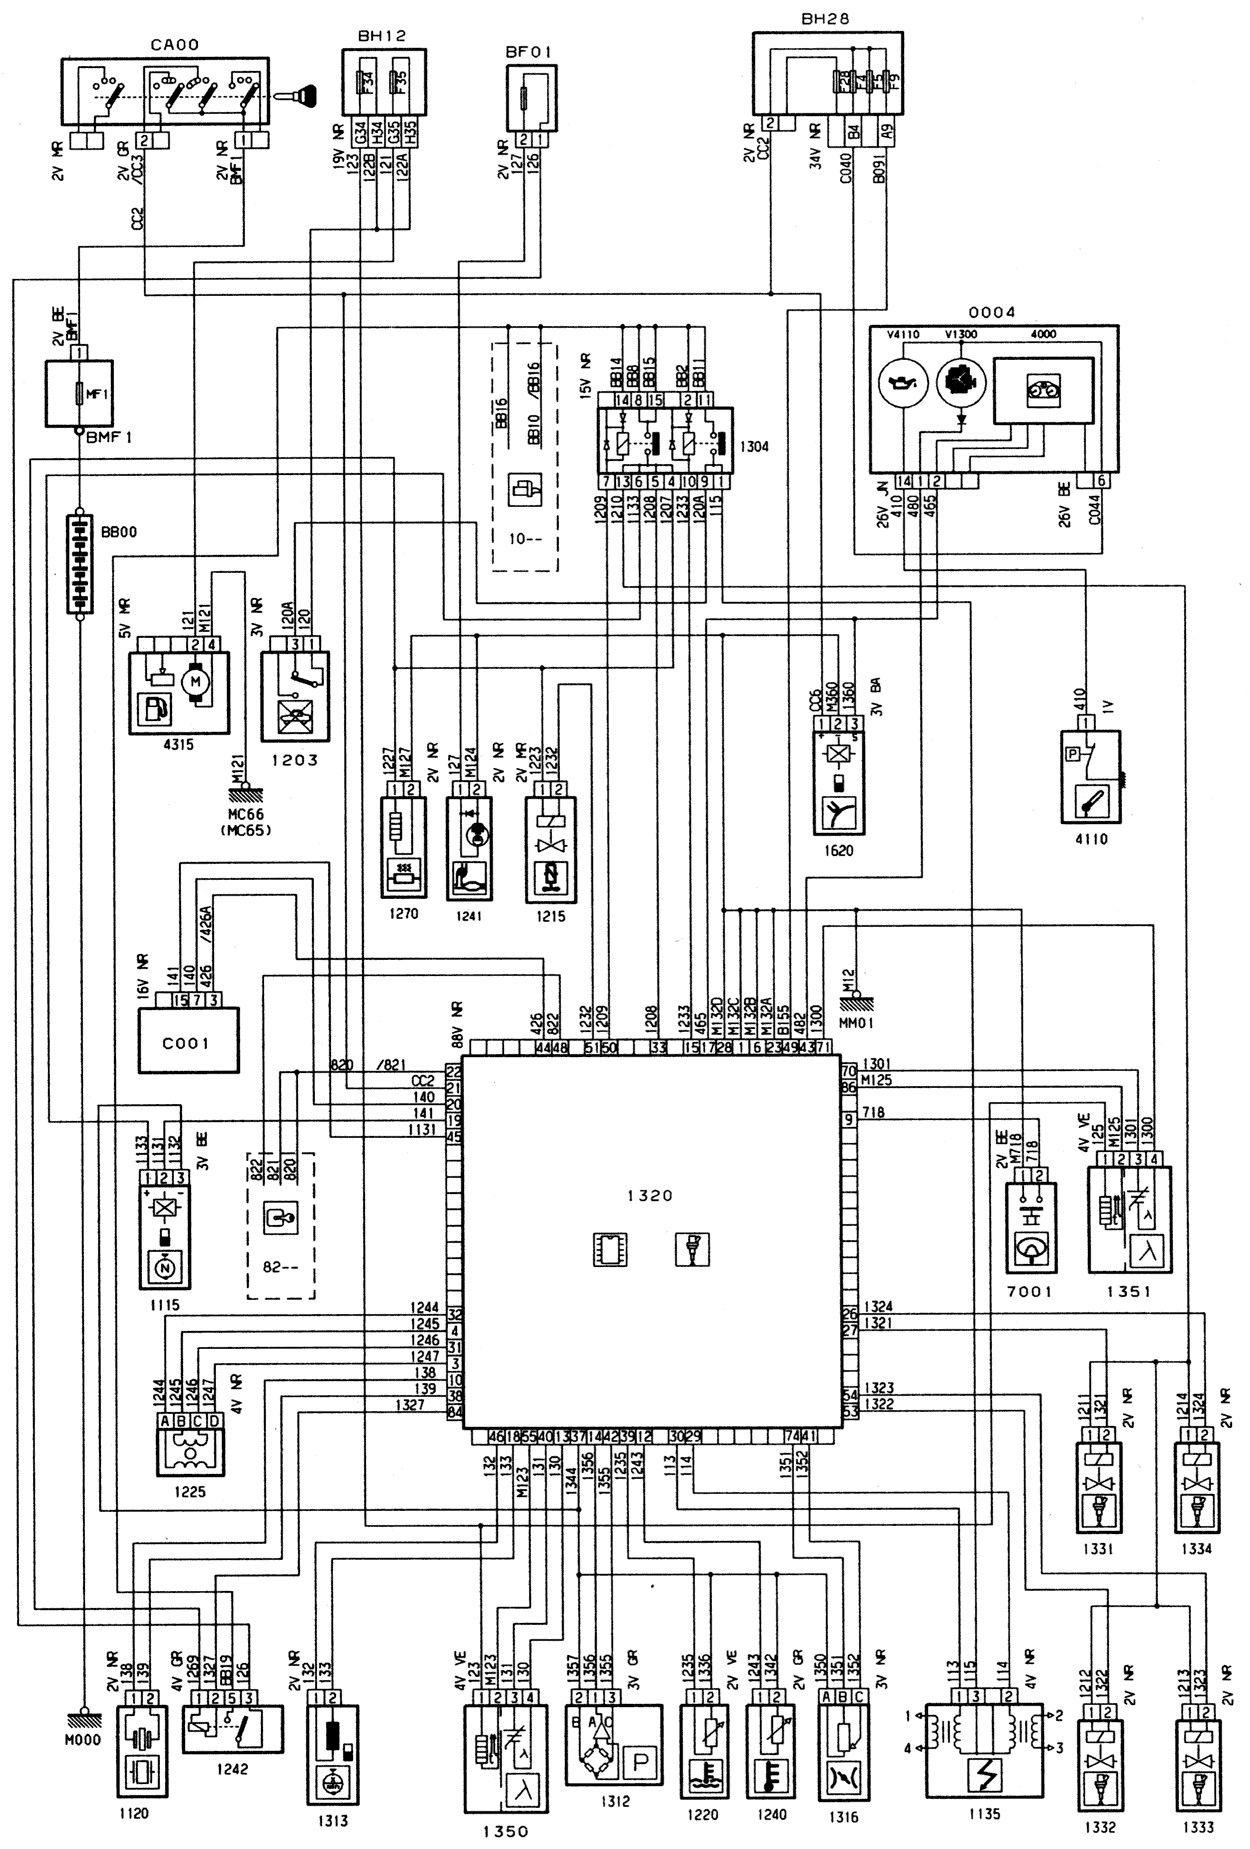 Unique Wiring Diagram For Auto Gauge Tachometer Car Gauges Tachometer Diagram